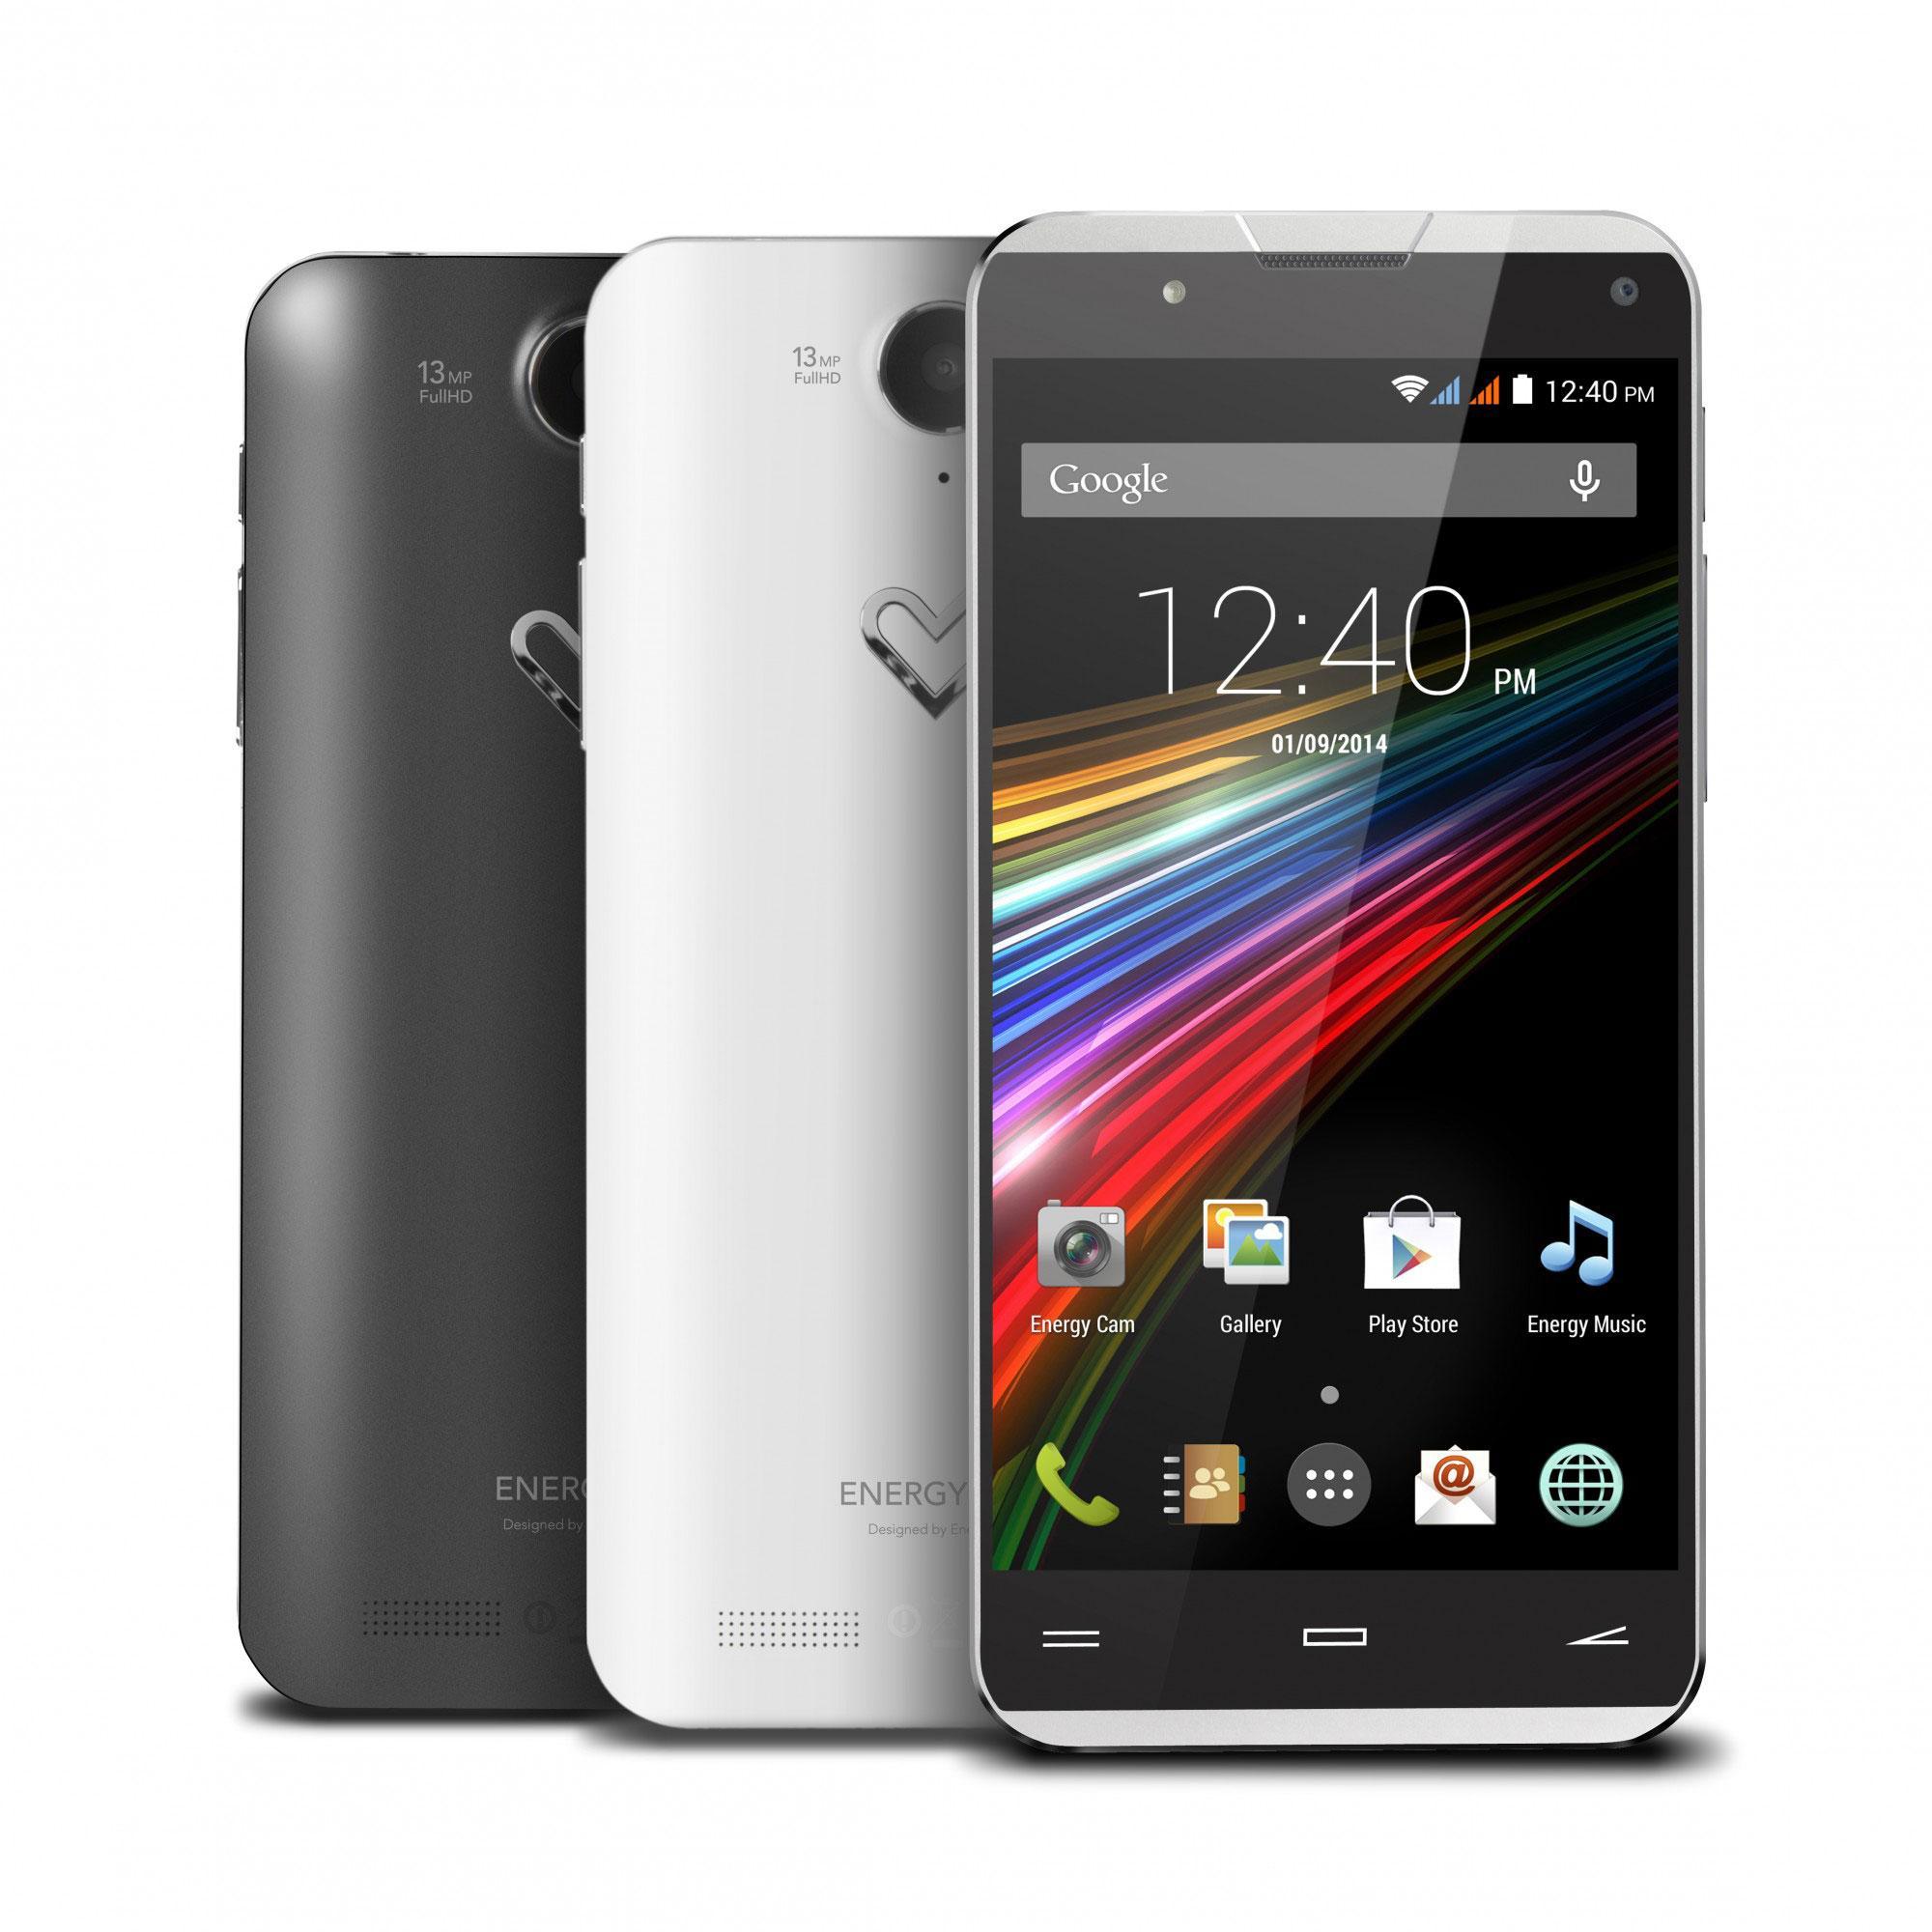 Energy Phone Pro Qi negro y blanco